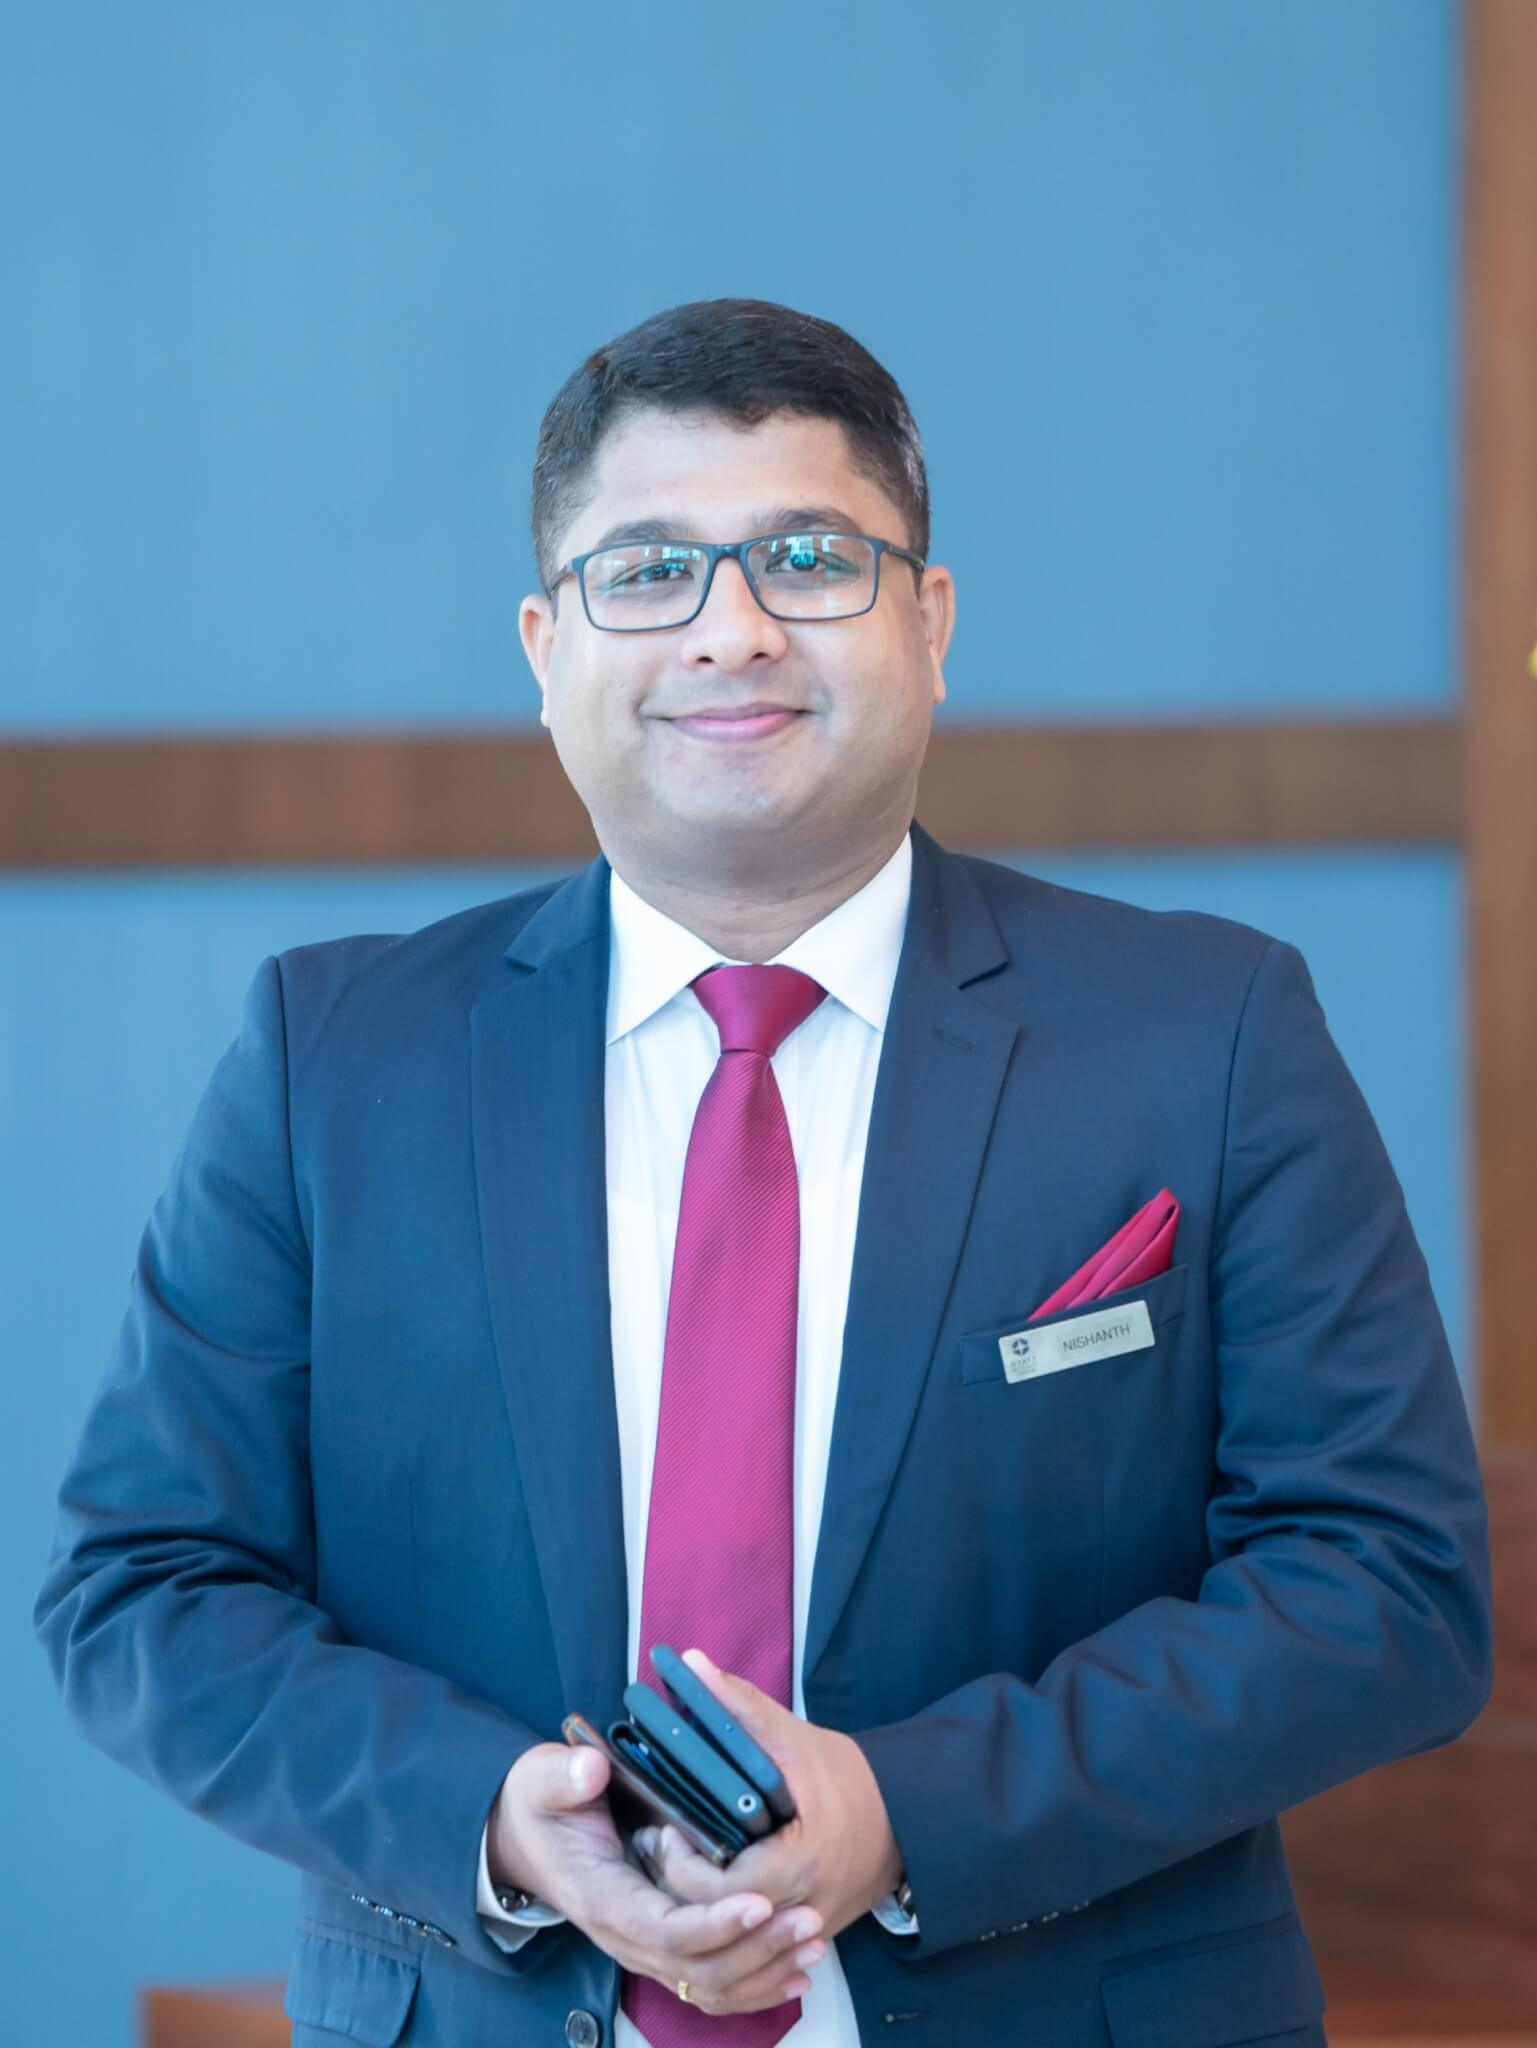 Hyatt in Kerala, India appoints Director of Sales